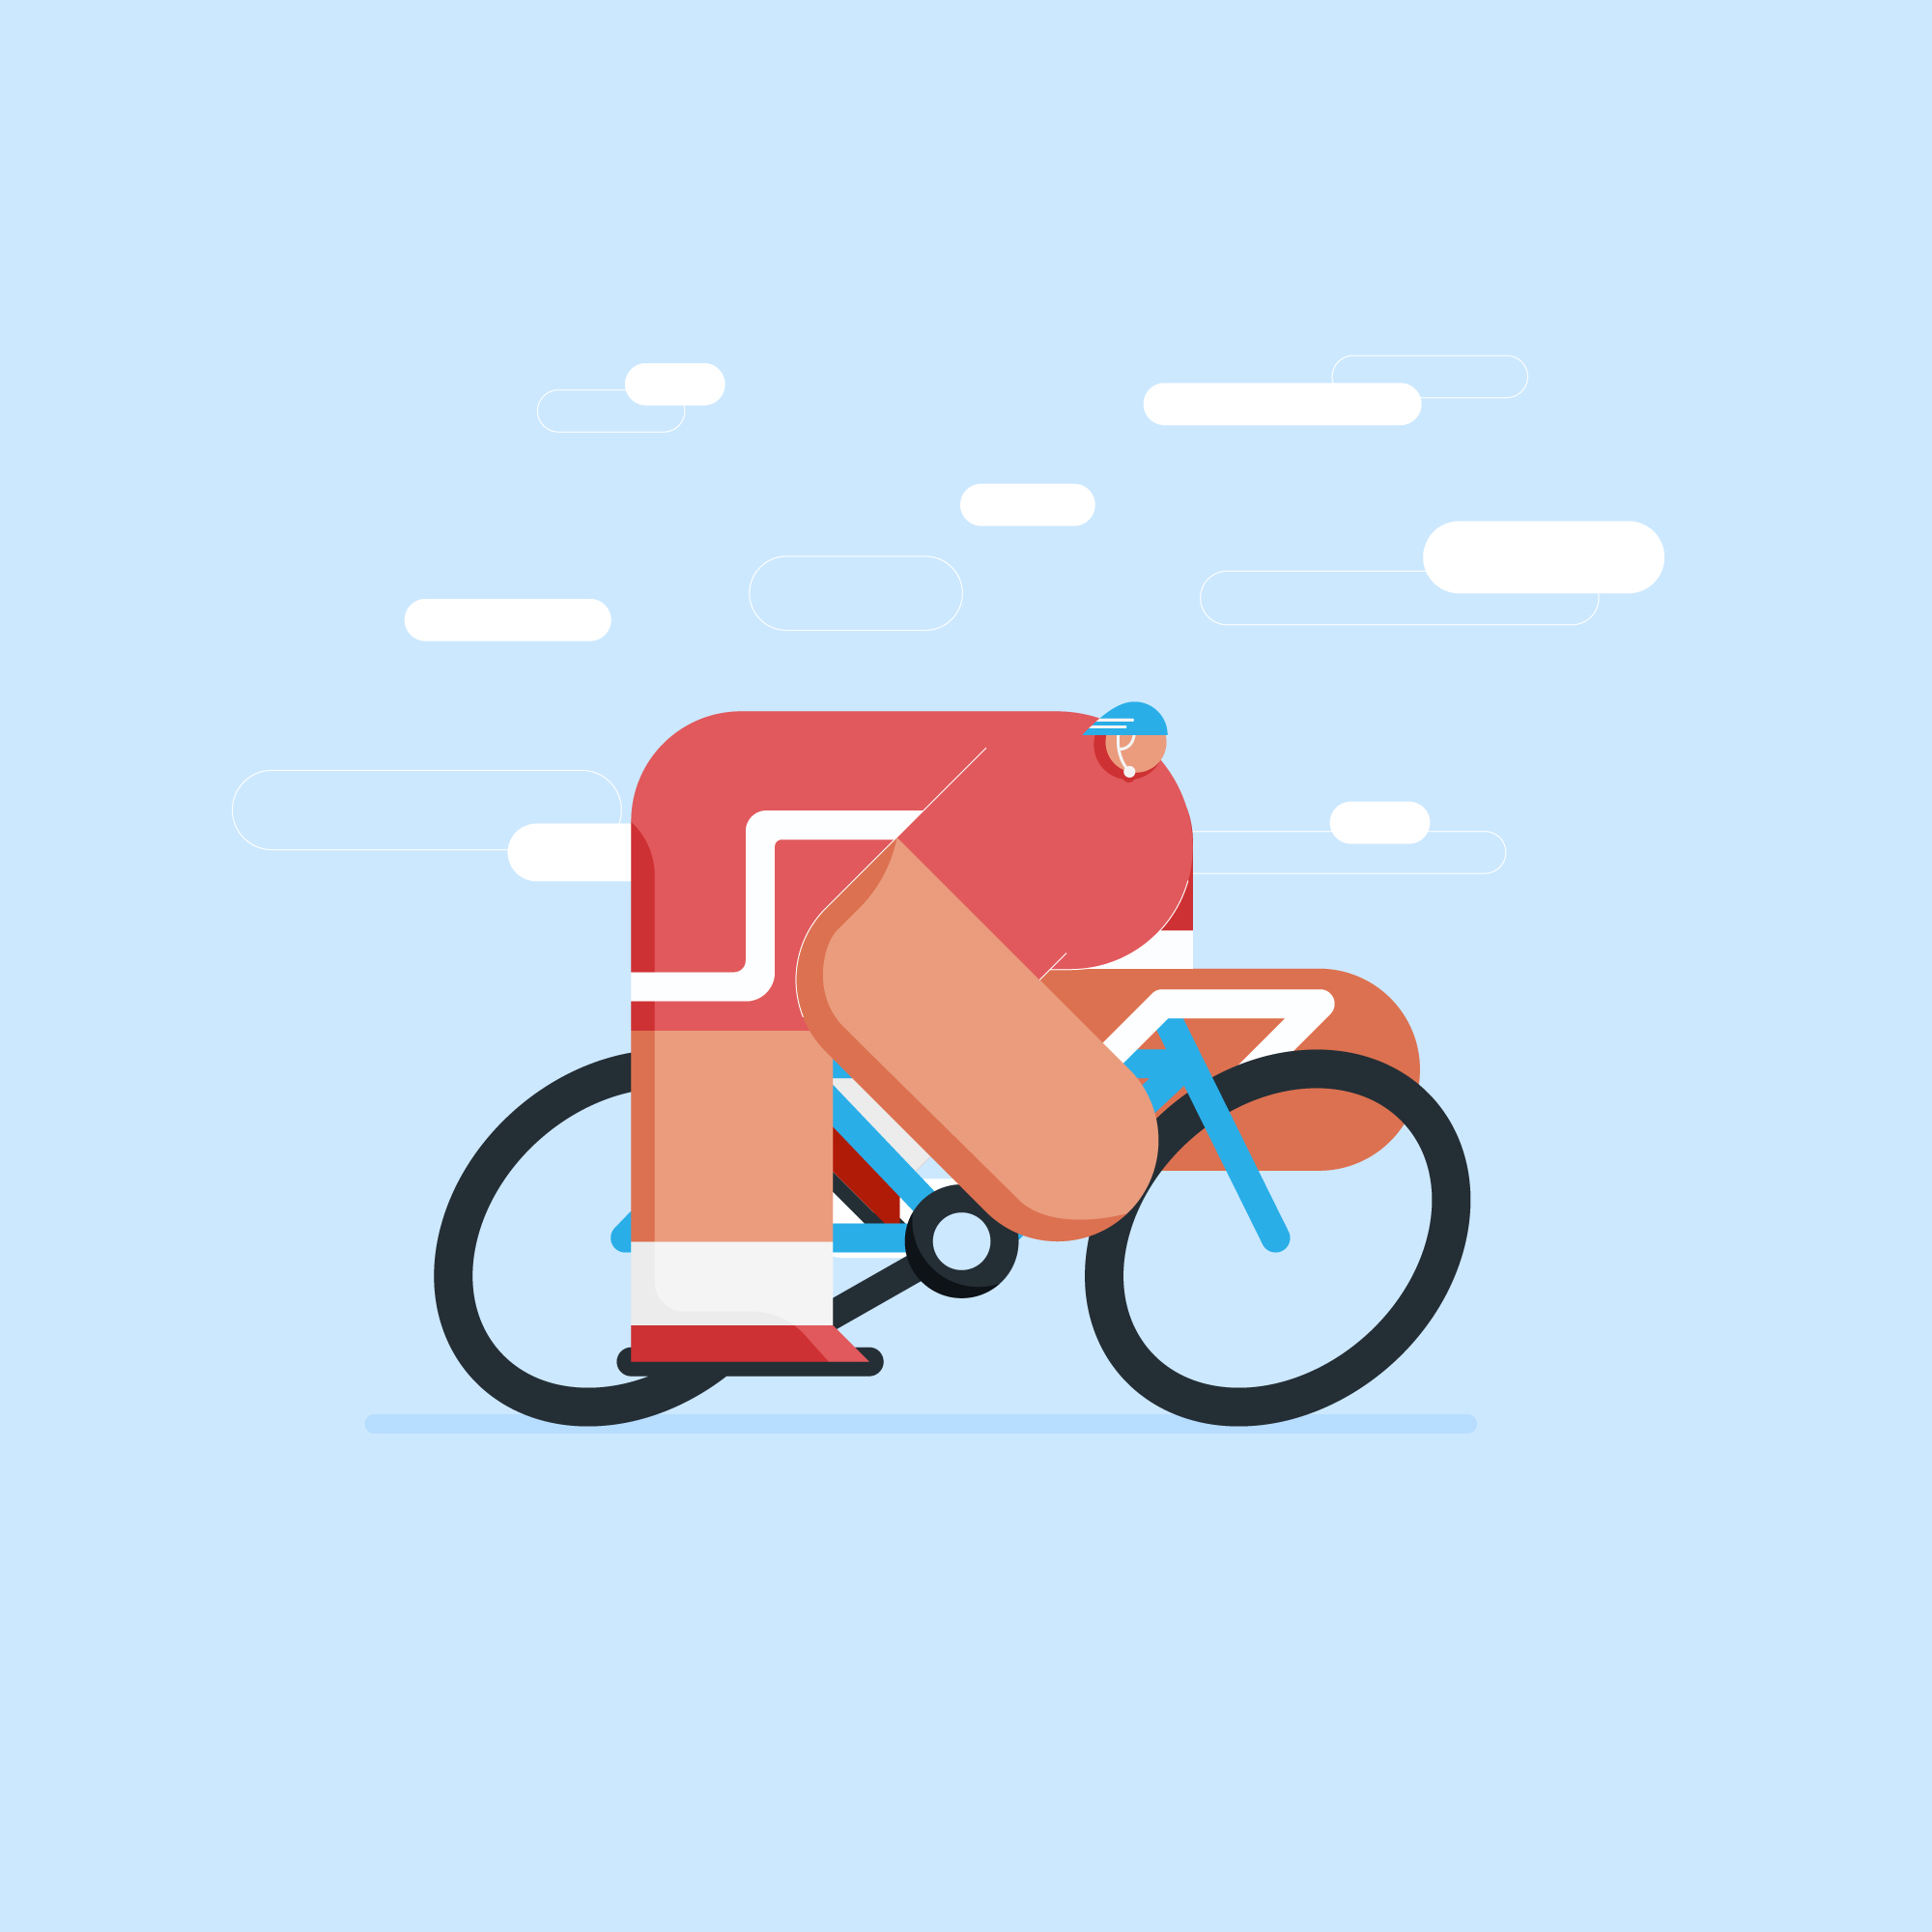 BigBuds_Cycling_Insta.jpg